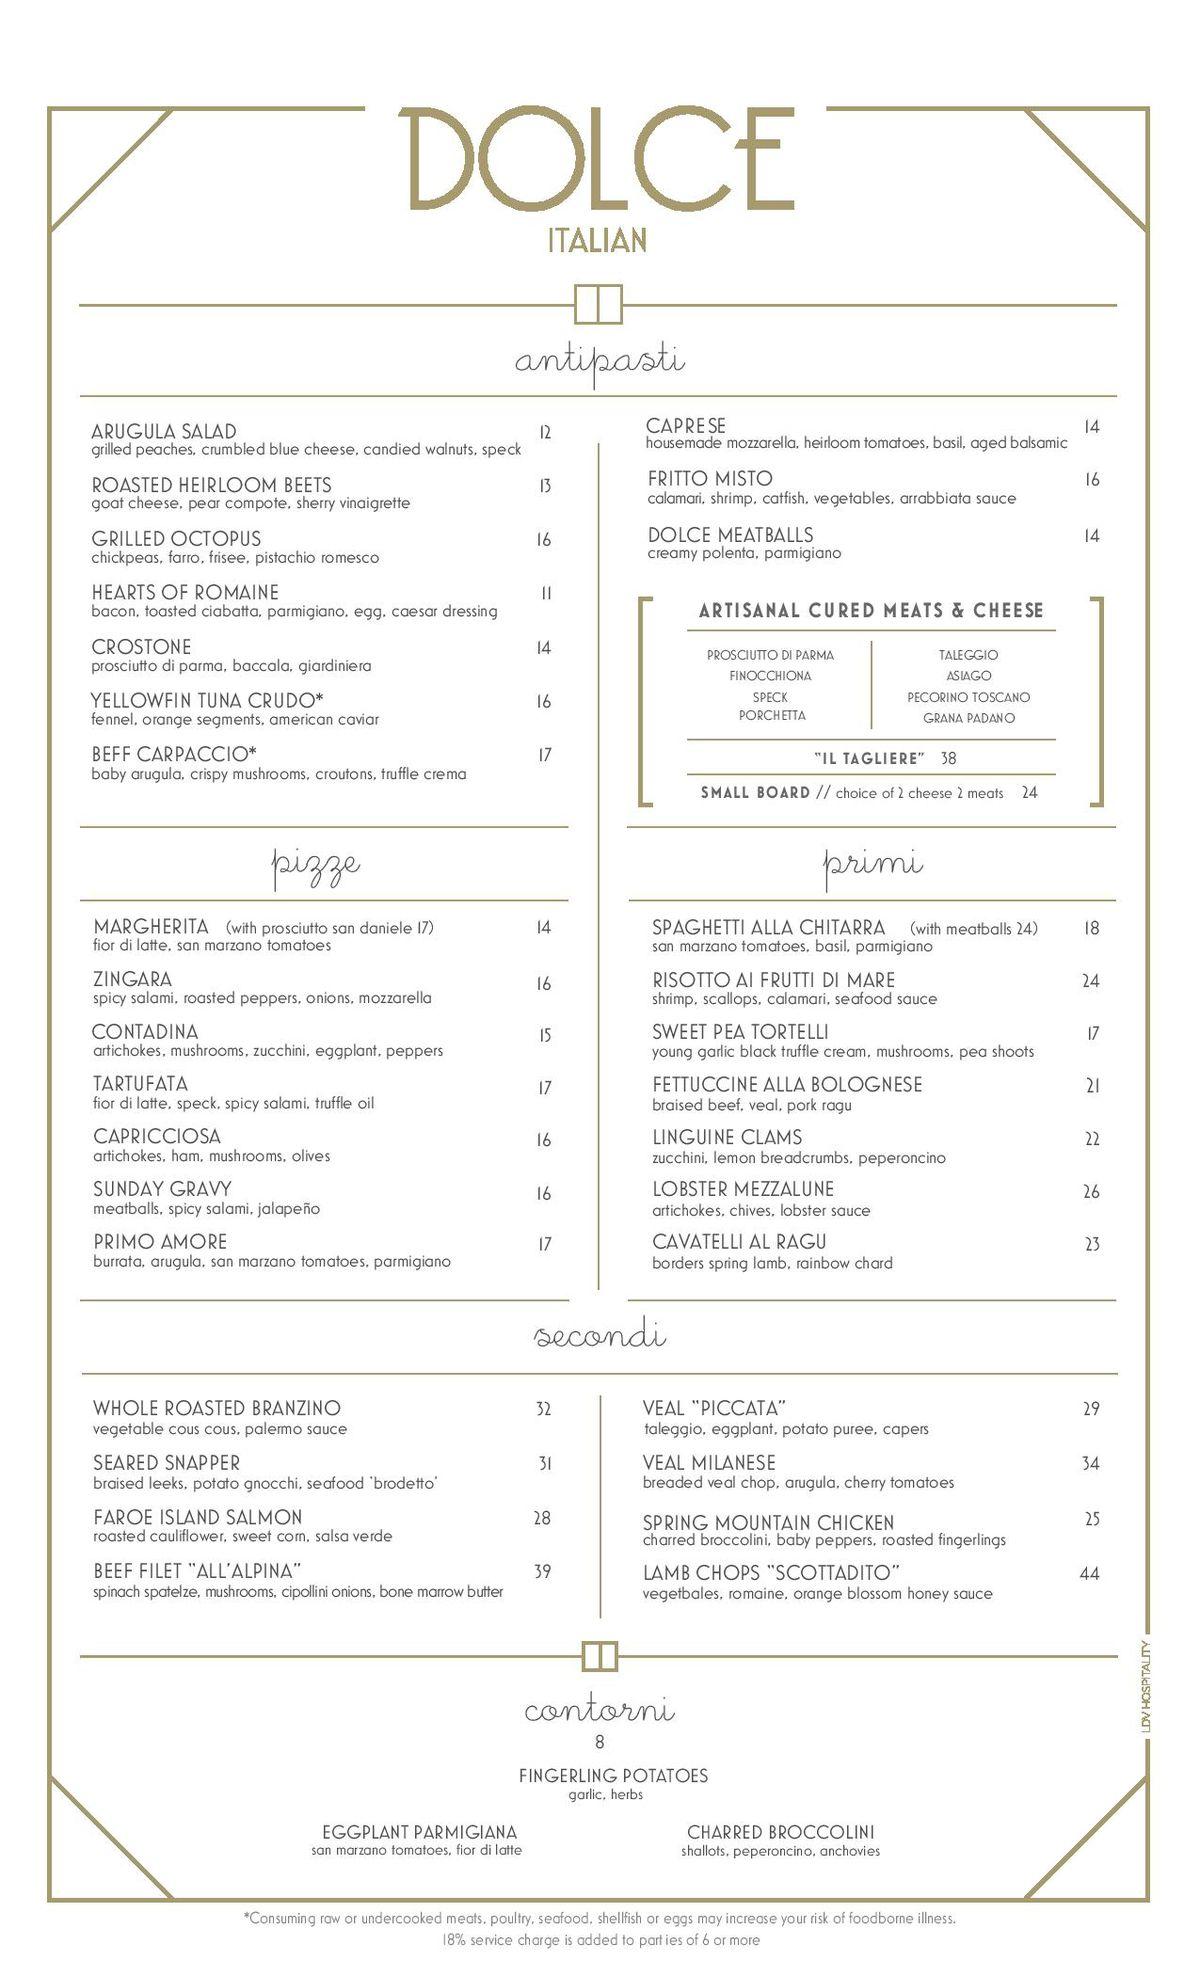 Dolce Italian menu